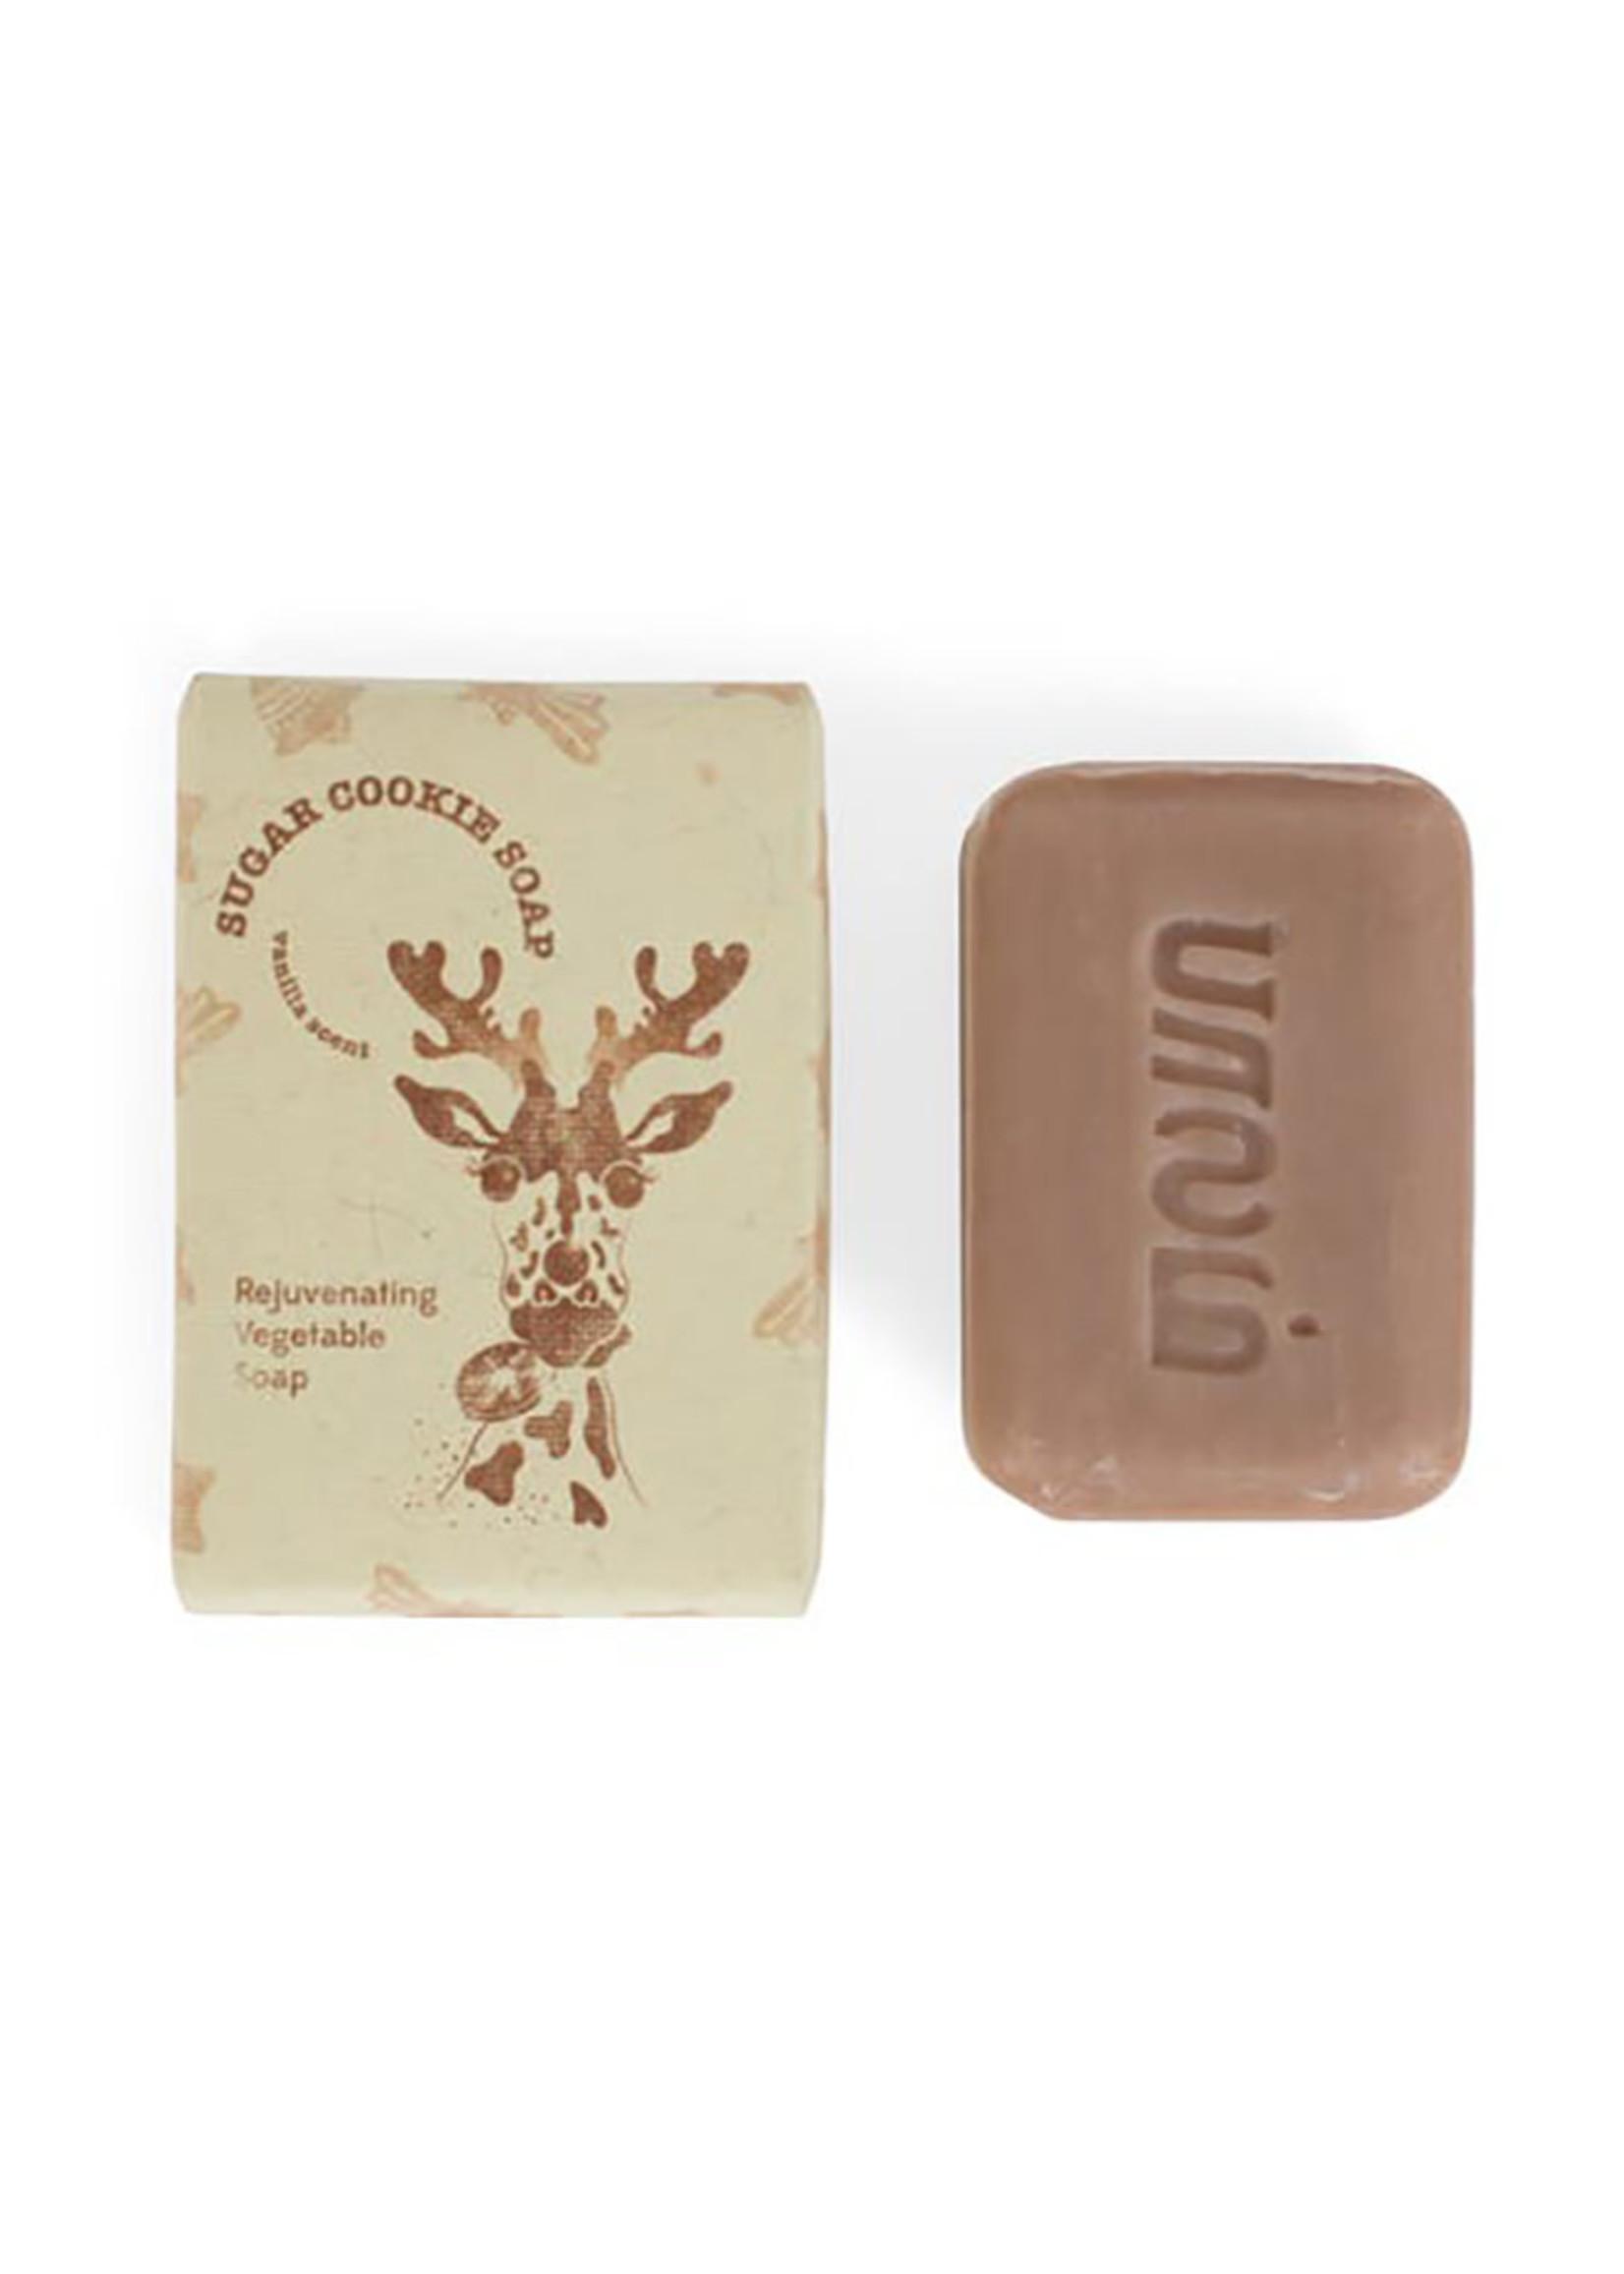 Sugar Cookie Soap